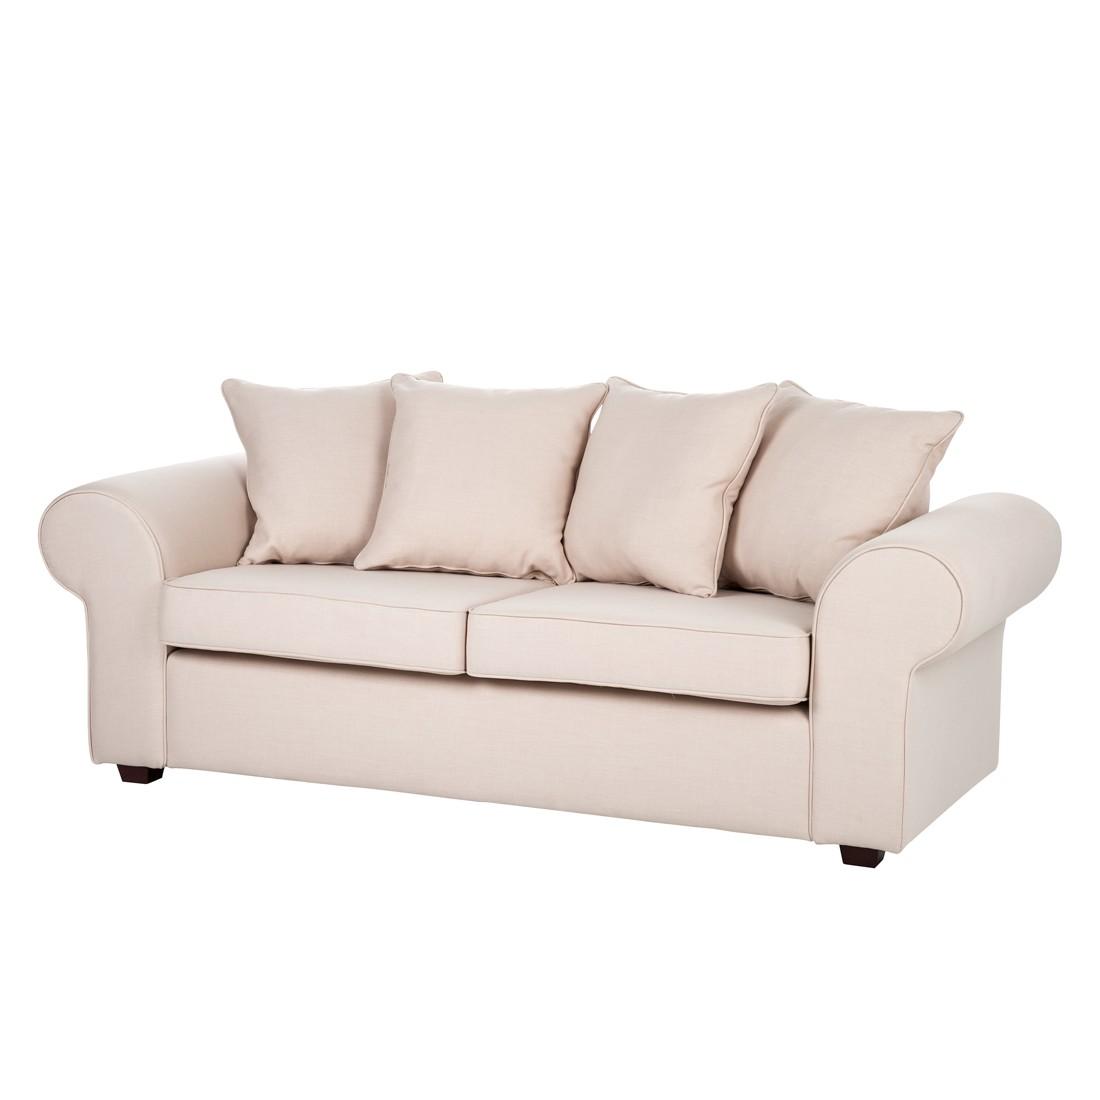 sofa abnehmbarer bezug ego bezug sofa homeandgarden 2 3 sitzer sofas online kaufen m bel. Black Bedroom Furniture Sets. Home Design Ideas